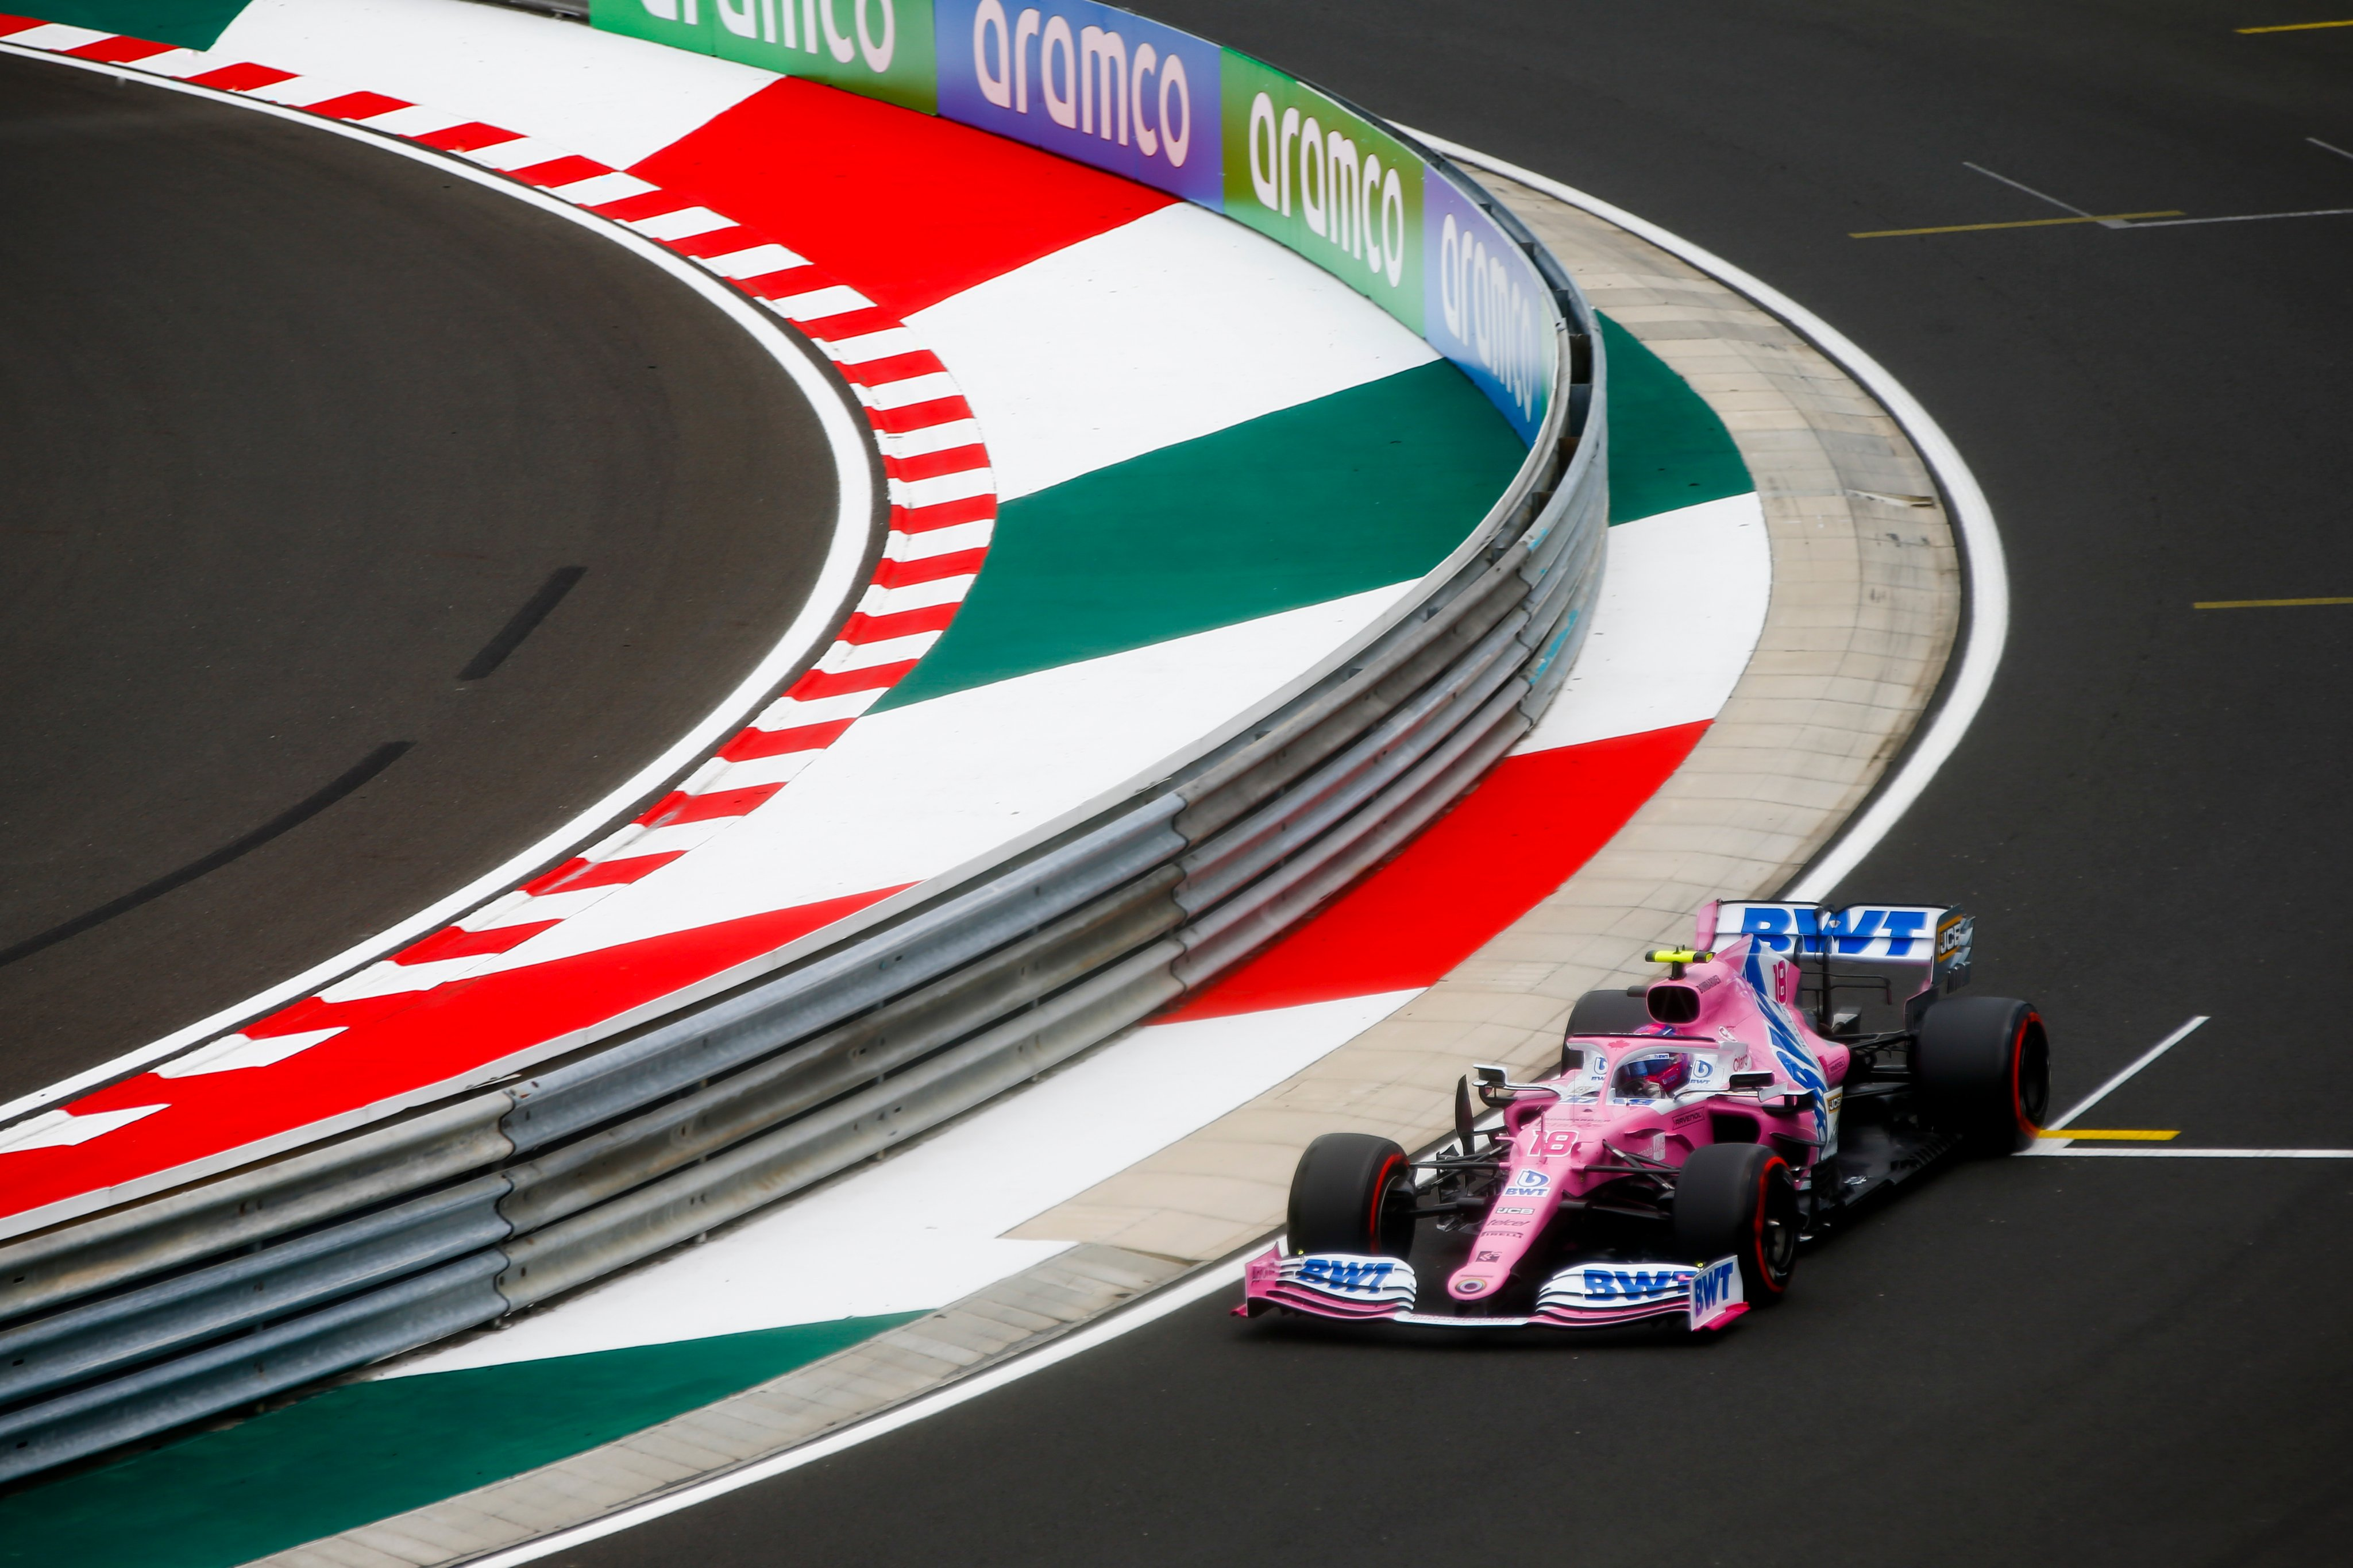 racing_point_gp_hungria